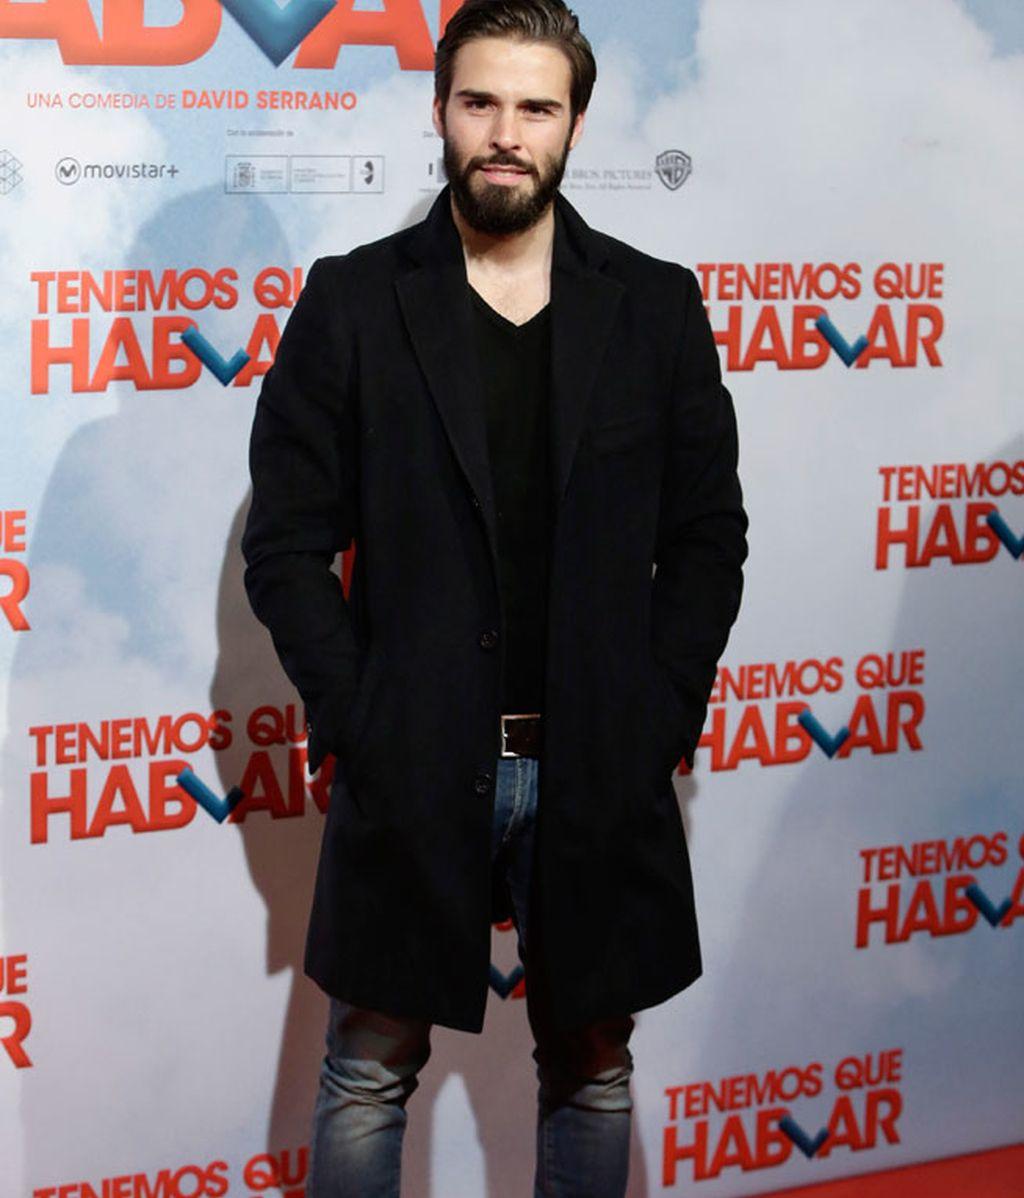 El actor Álex Barahona